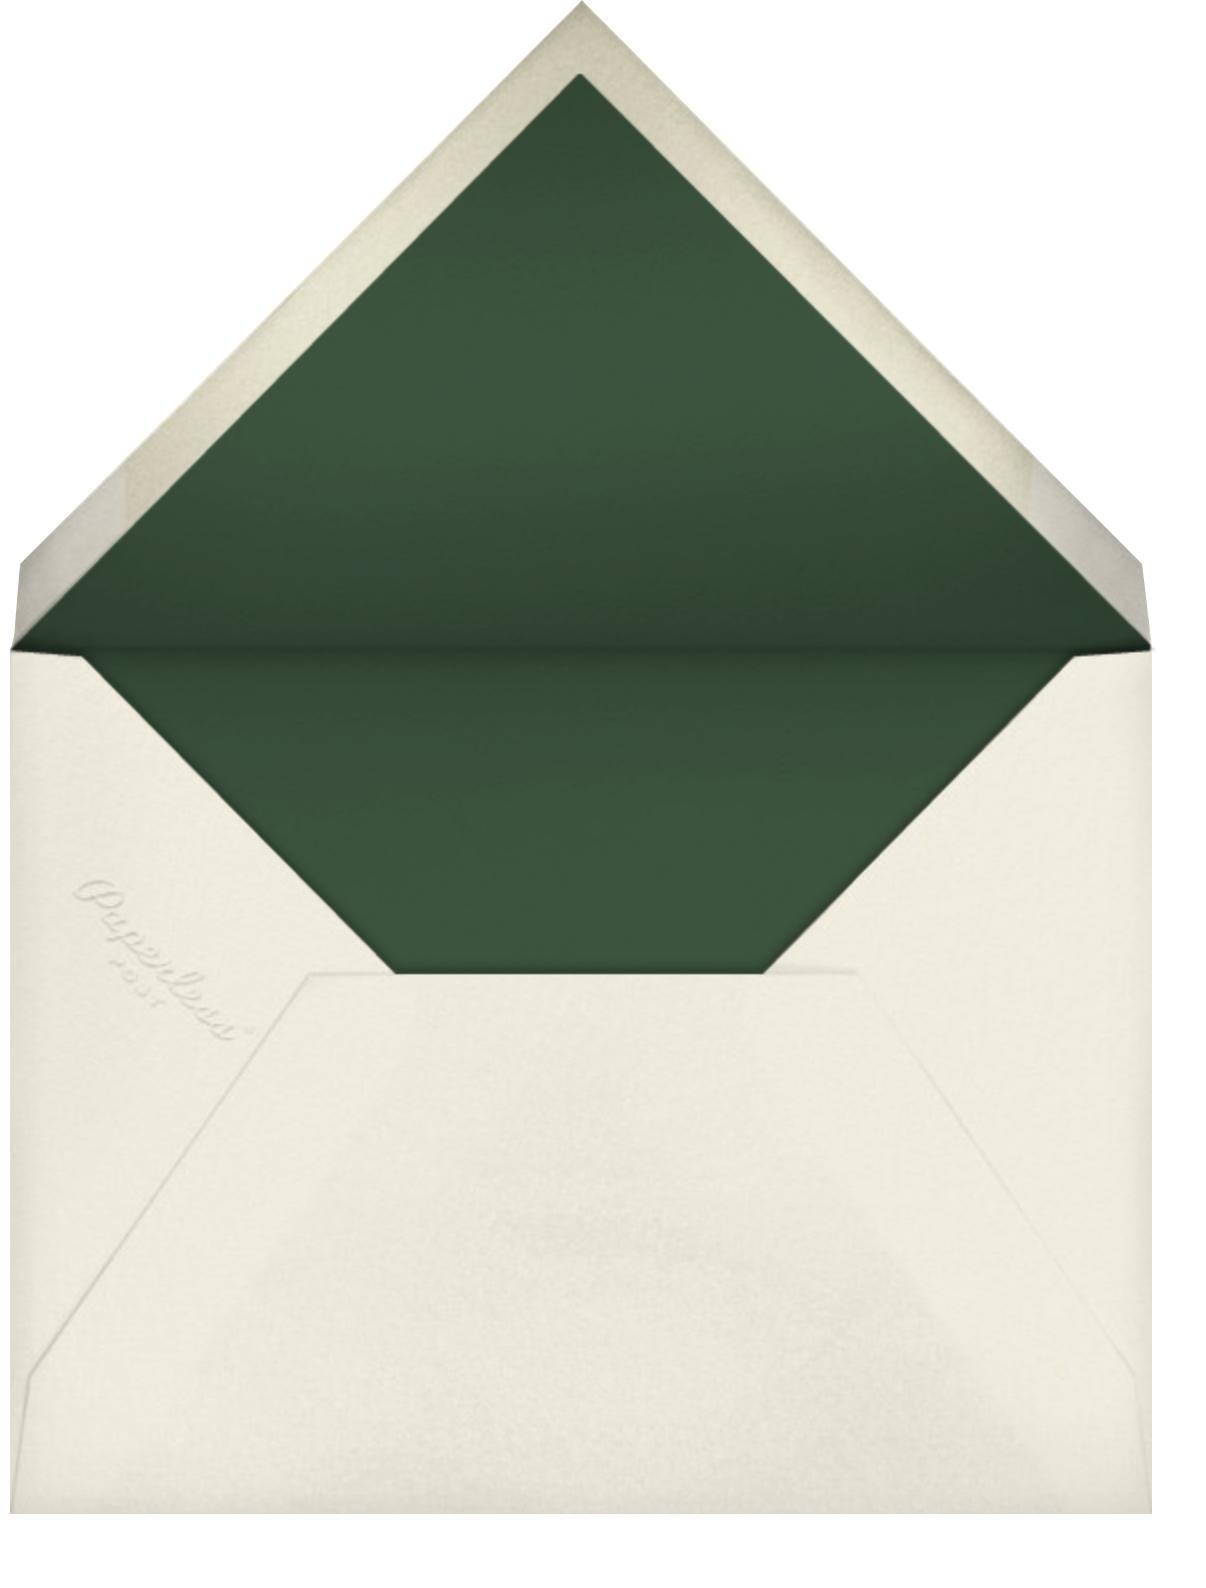 Selvatico - Pavlova - Venamour - Save the date - envelope back